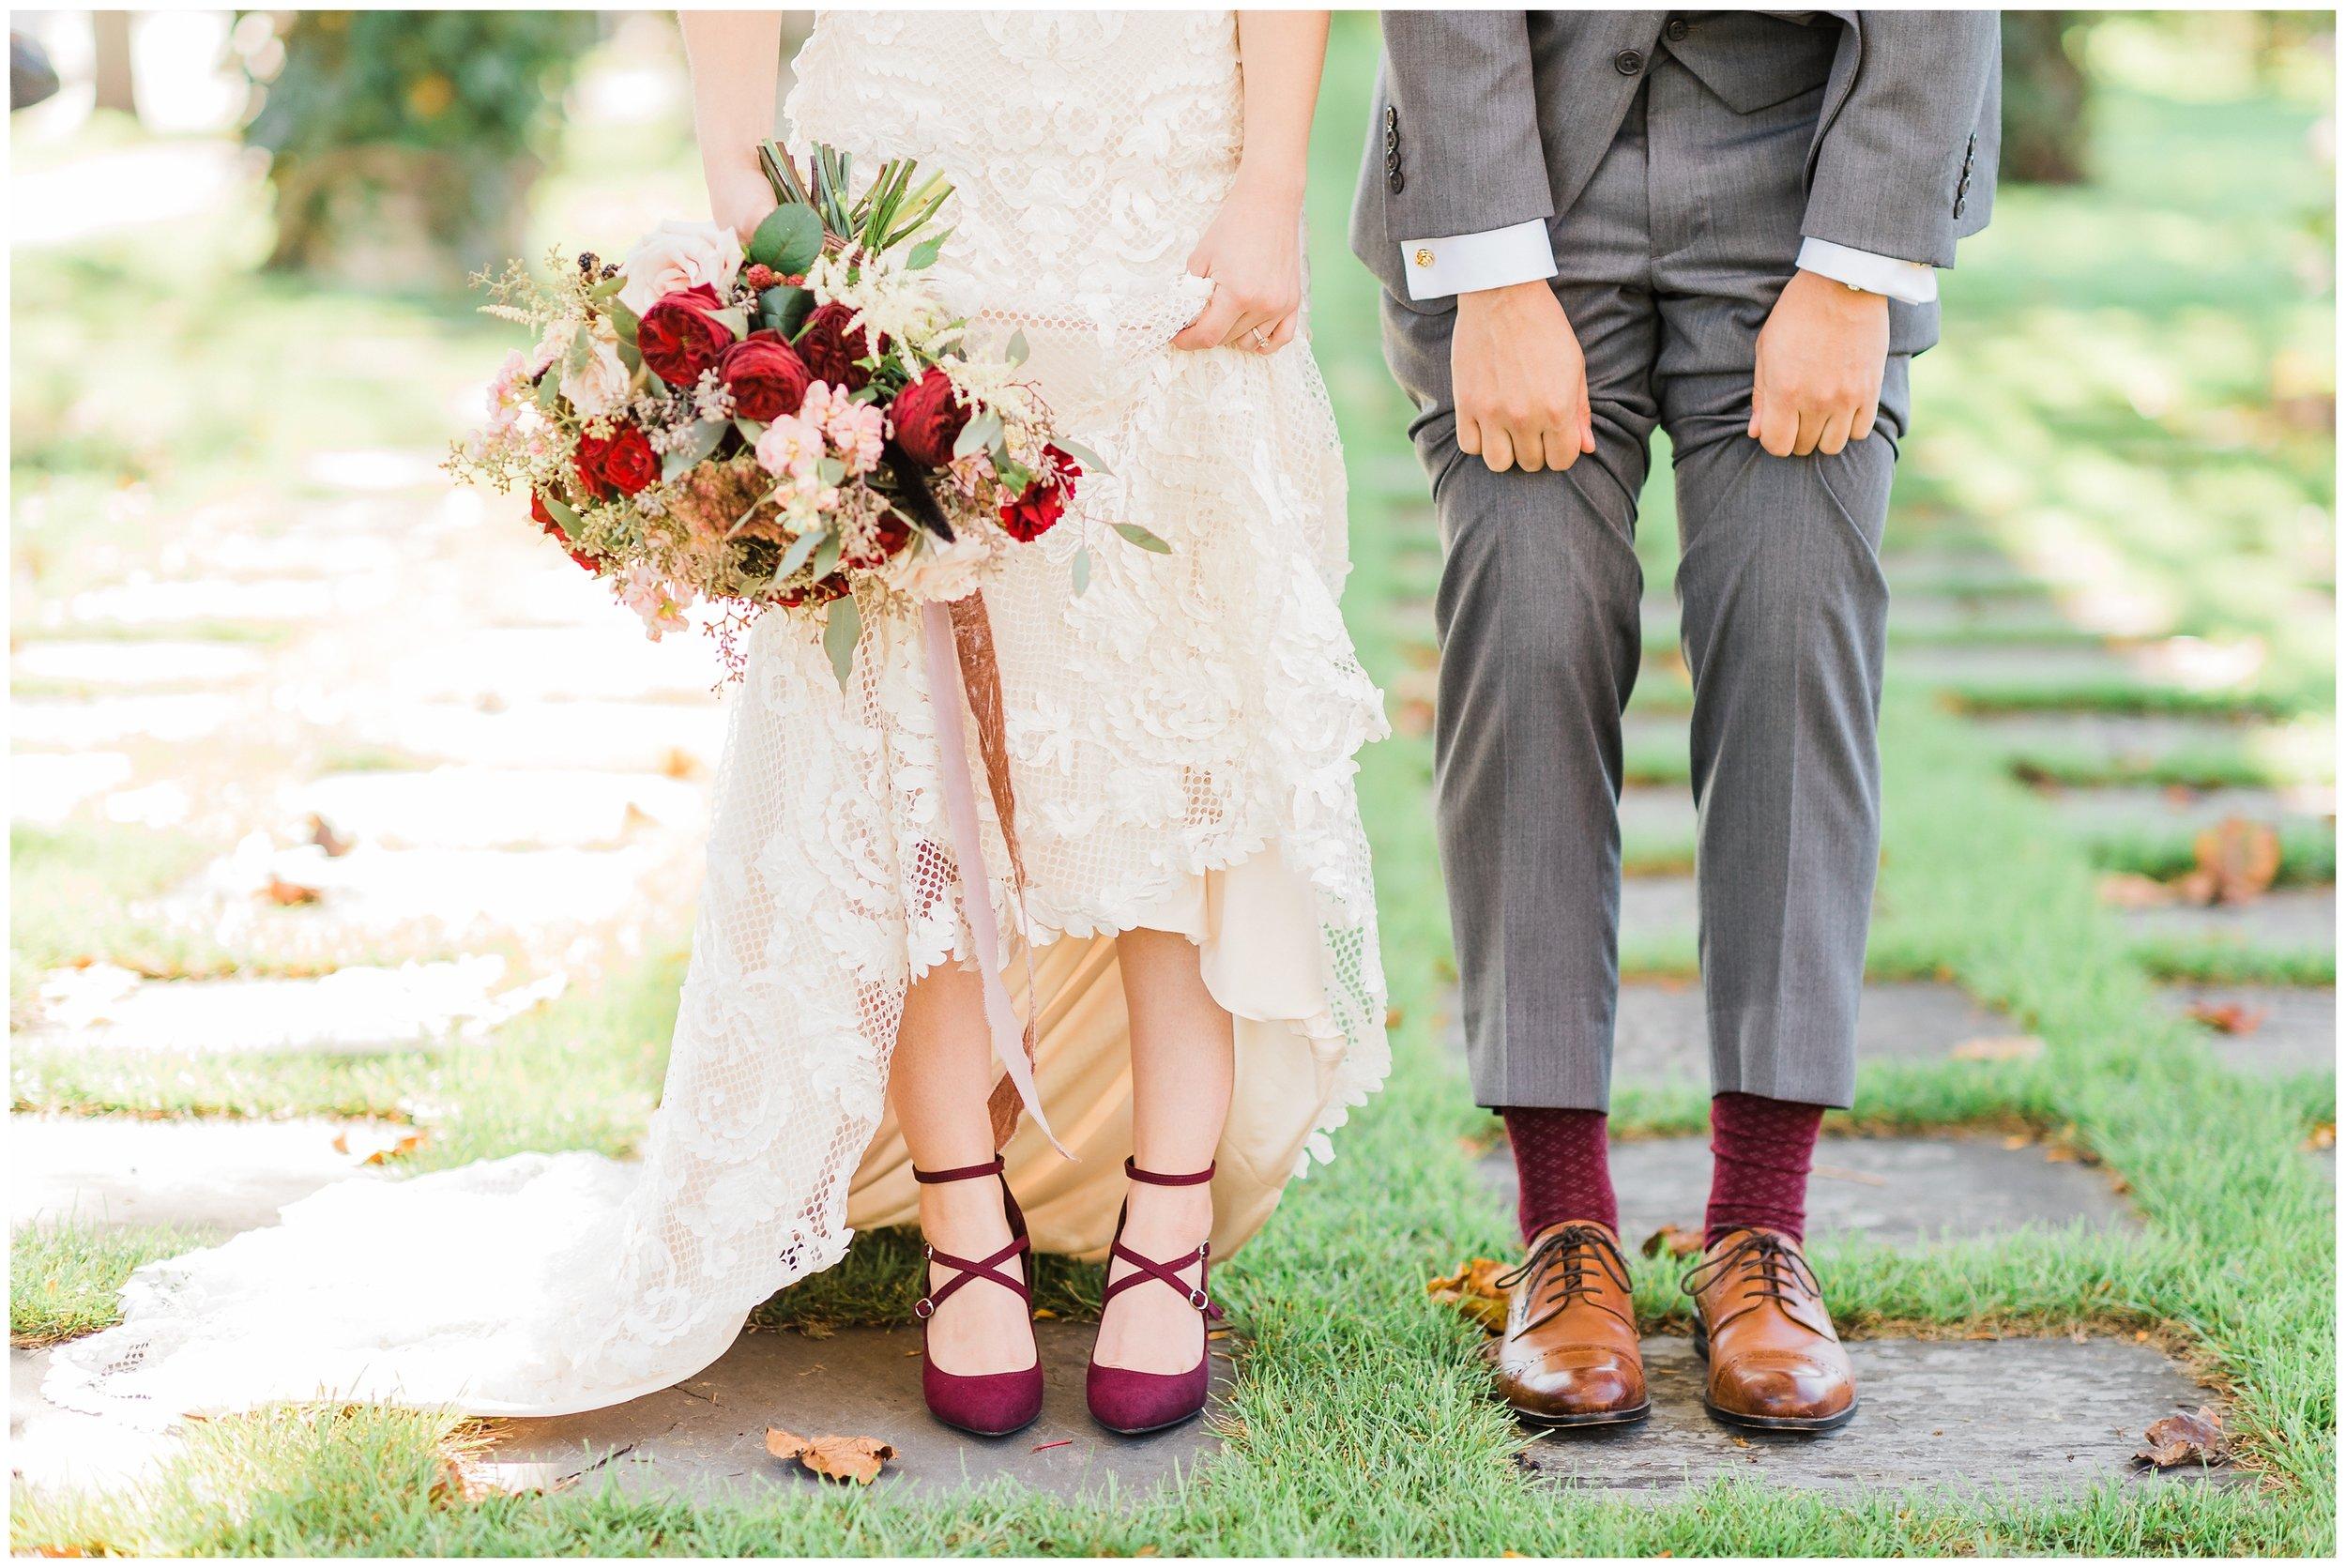 Rebecca_Shehorn_Photography_Indianapolis_Wedding_Photographer_7314.jpg